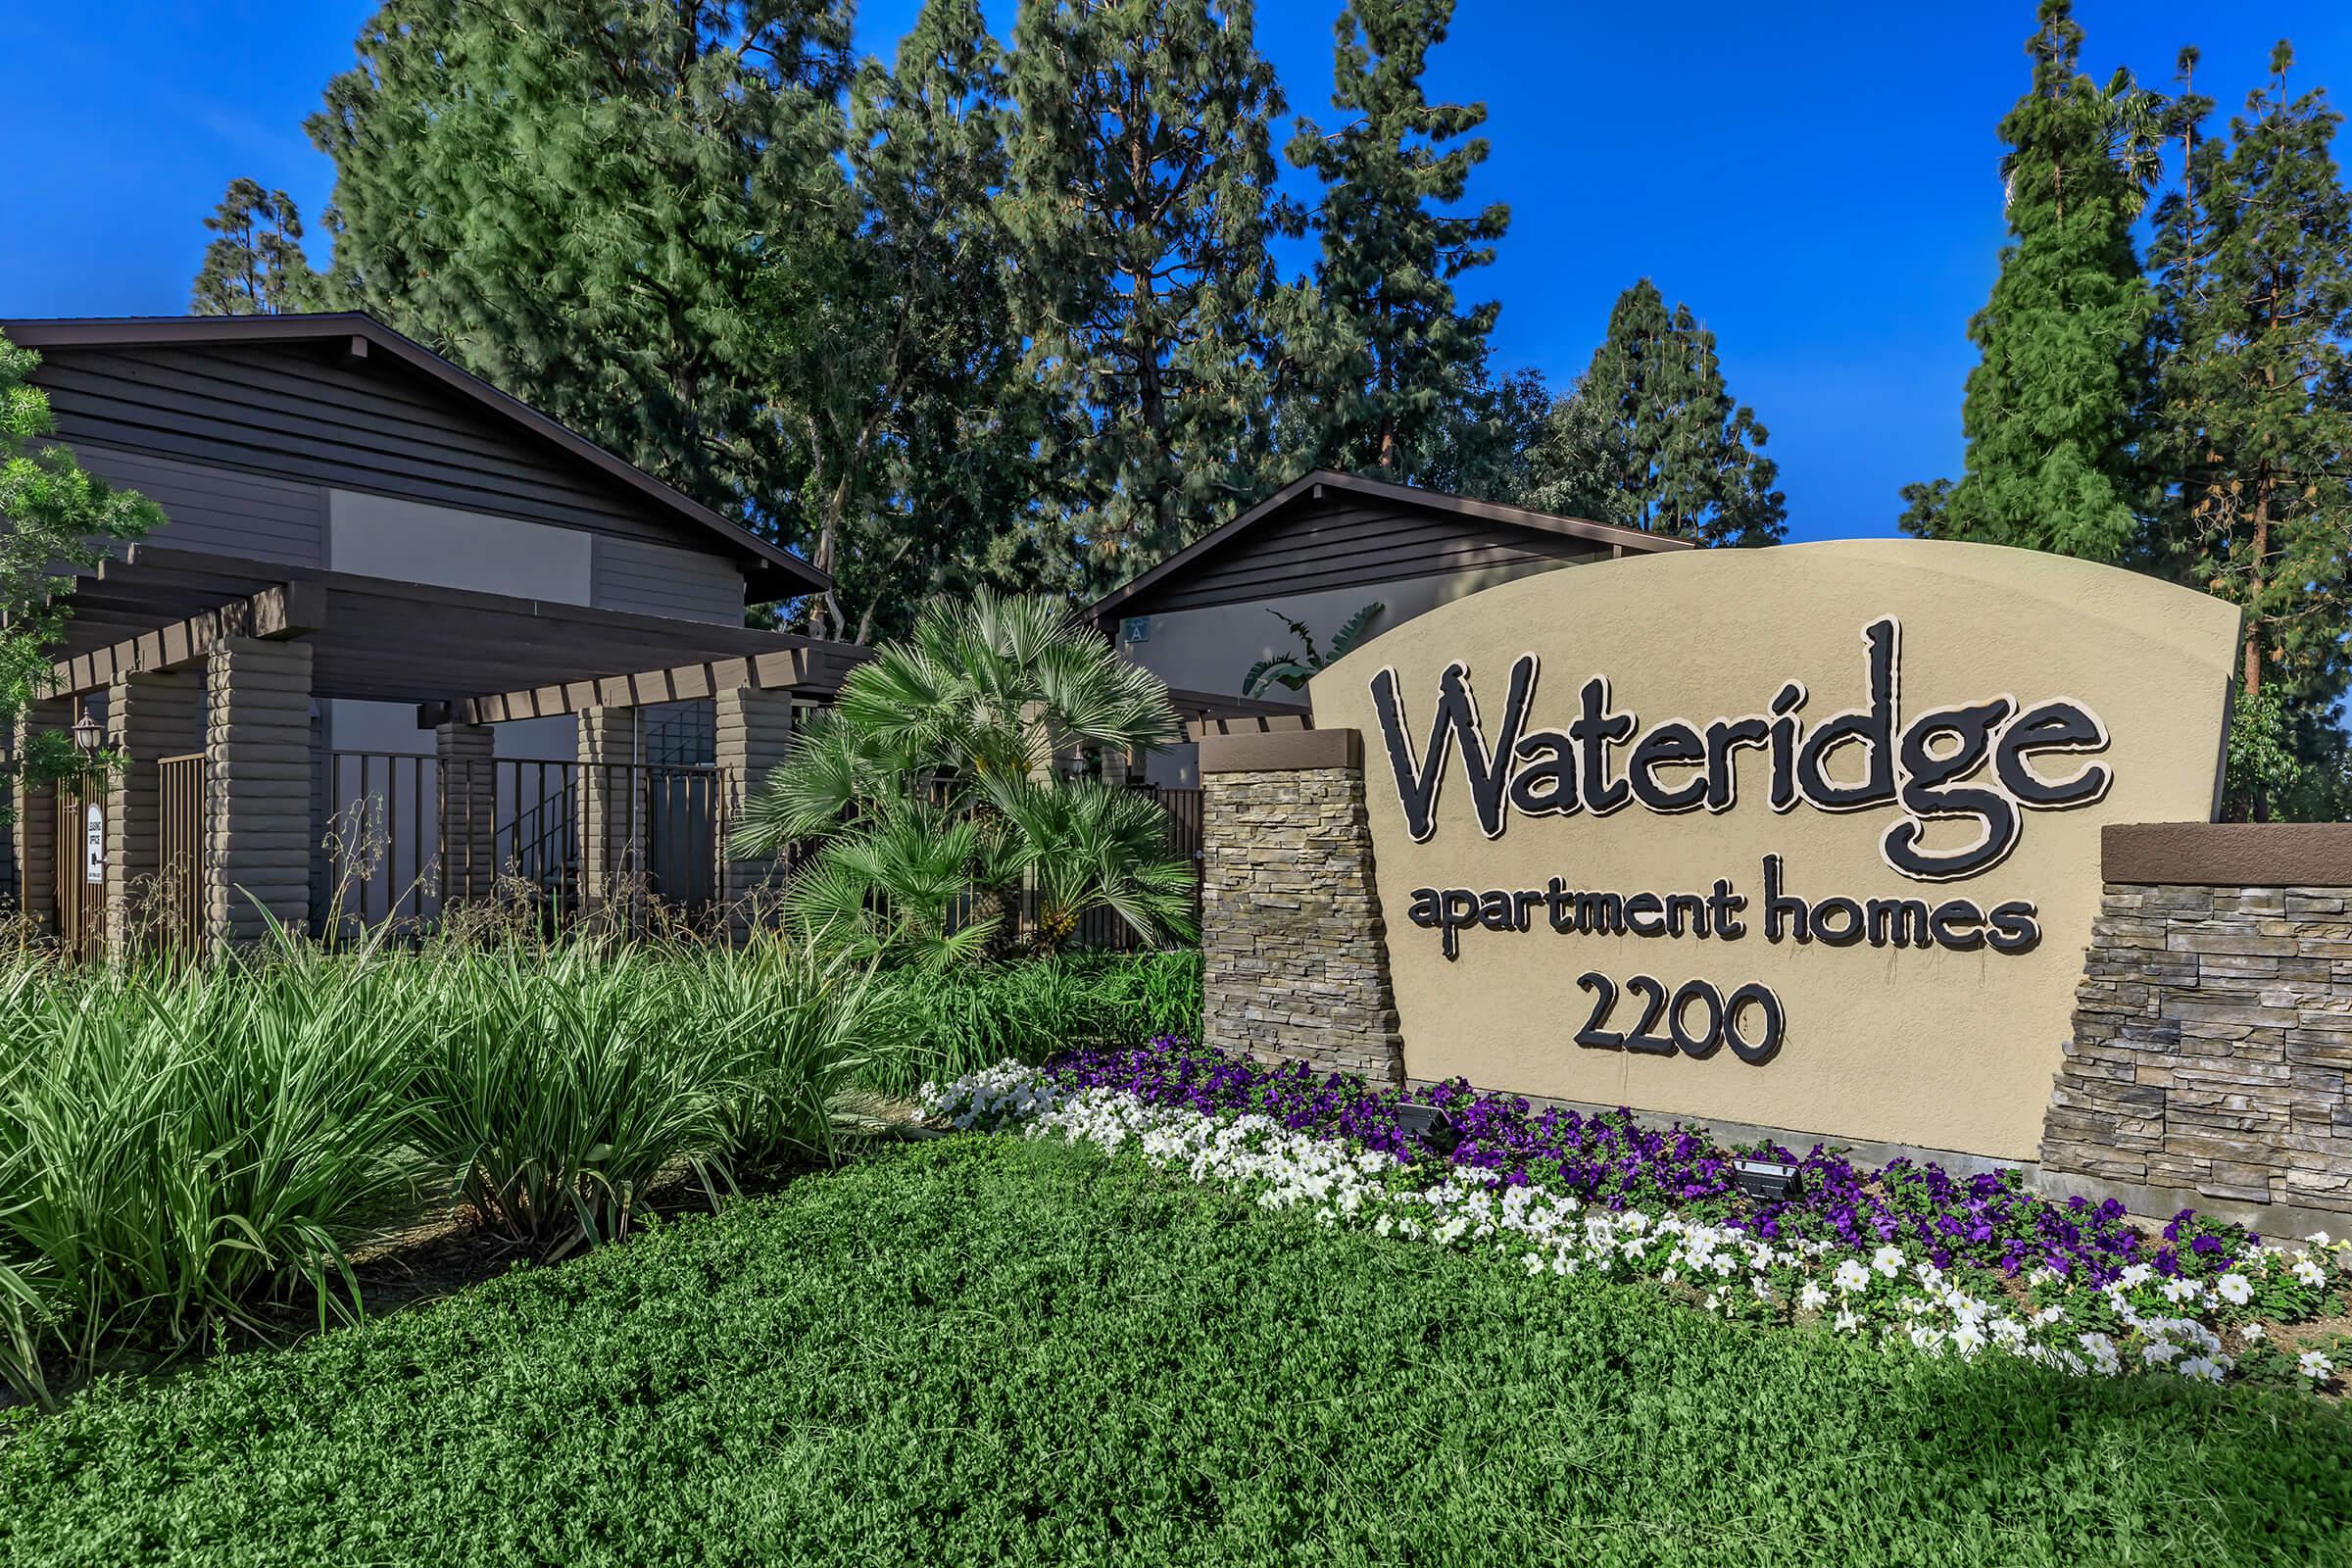 Wateridge Apartment Homes monument sign